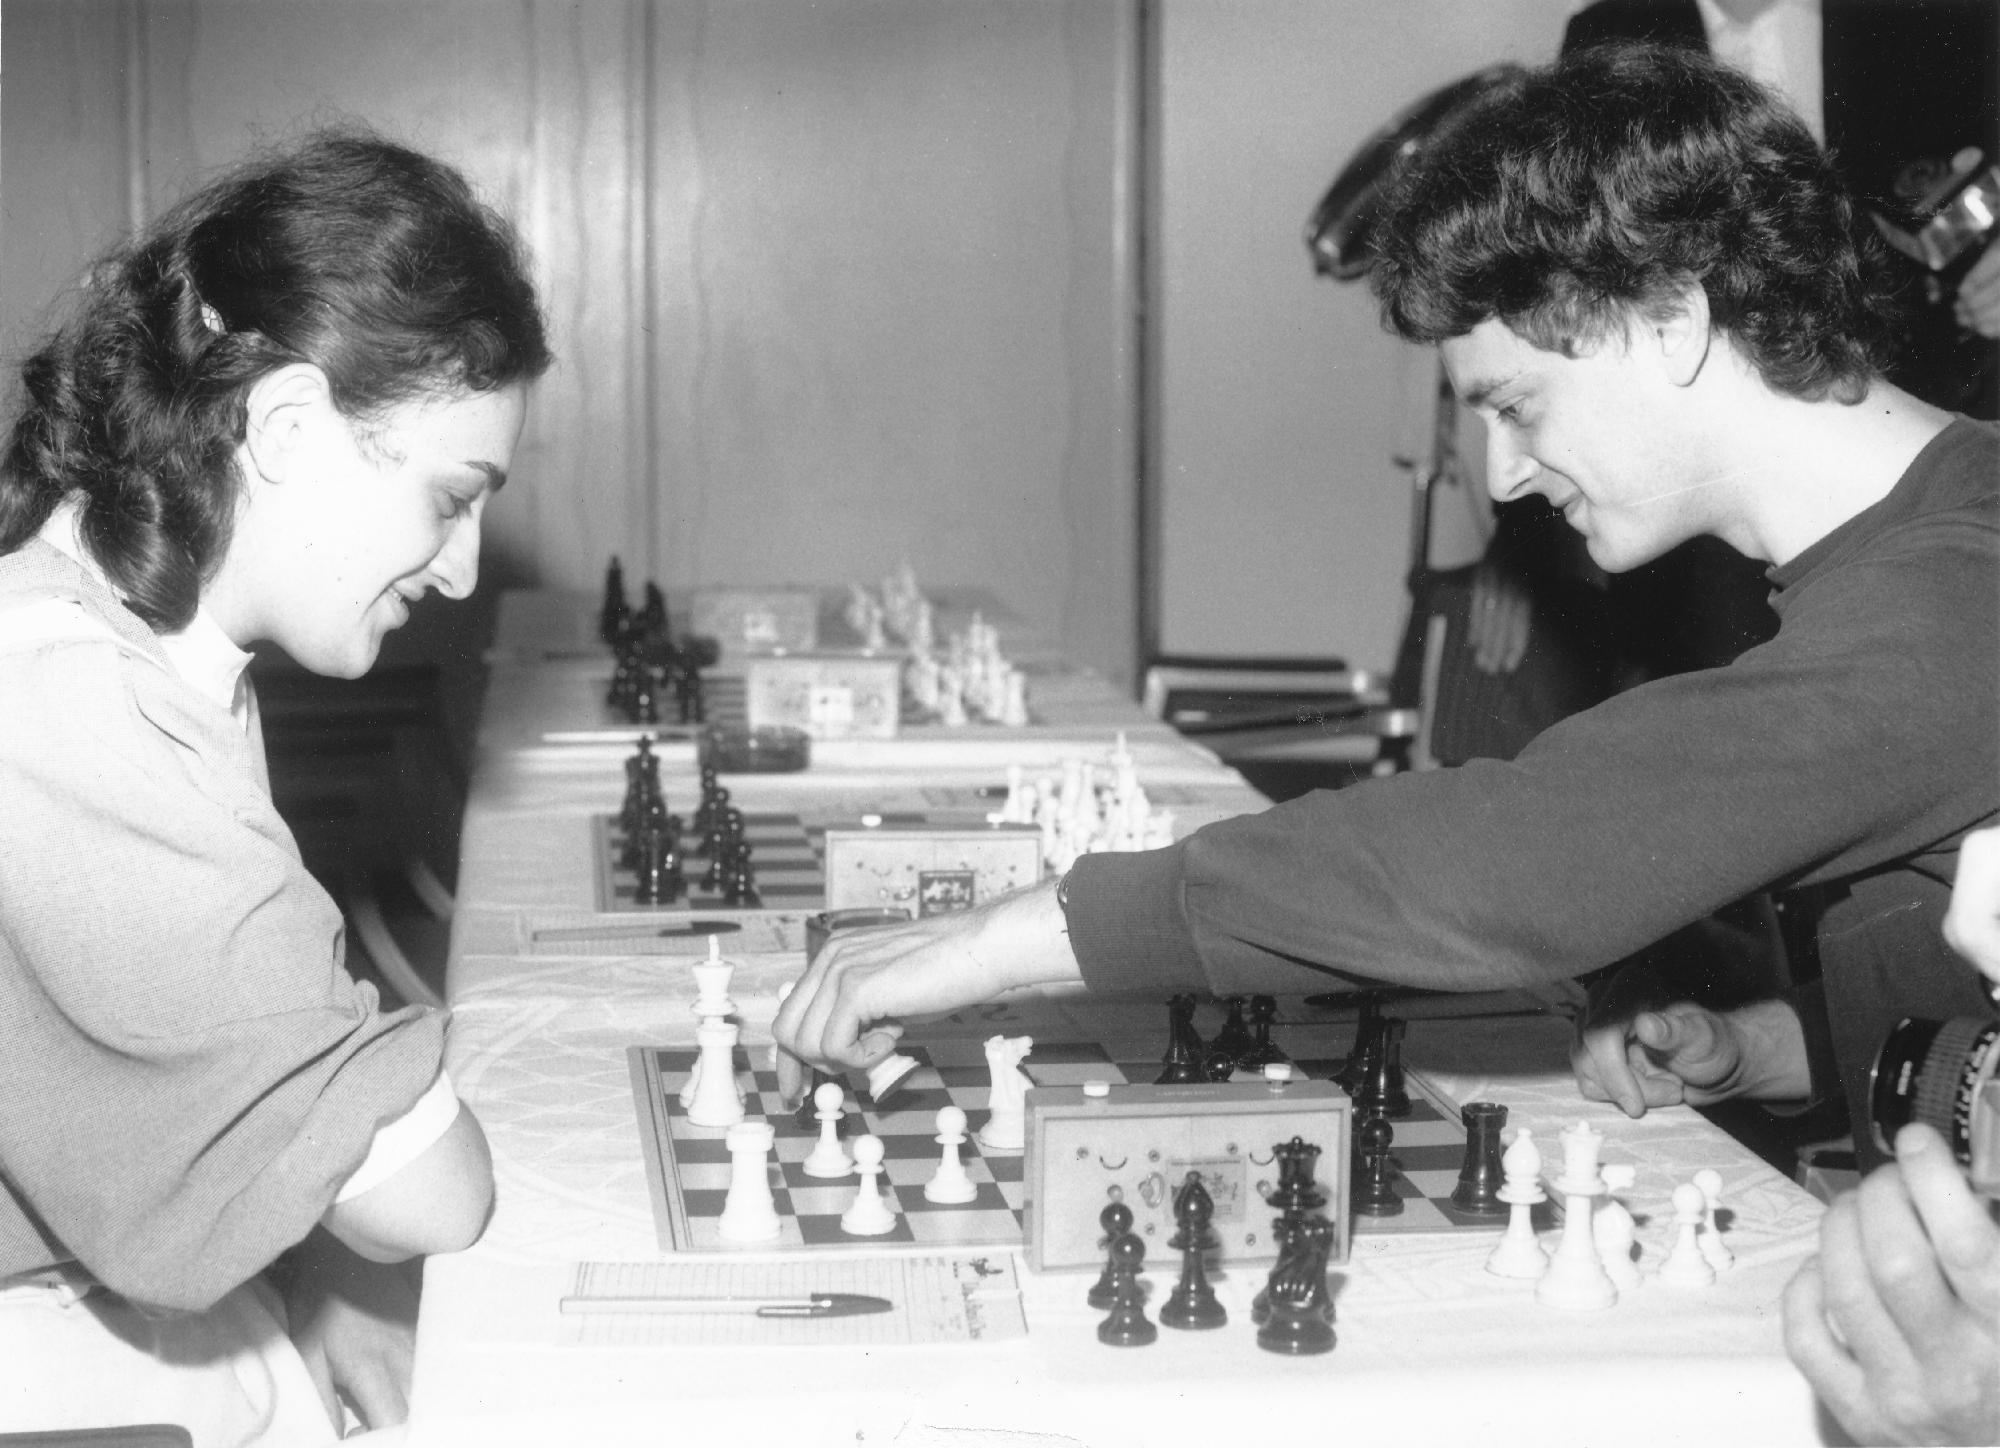 Maia Chiburdanidze and John Nunn from Lloyds Bank, 1985